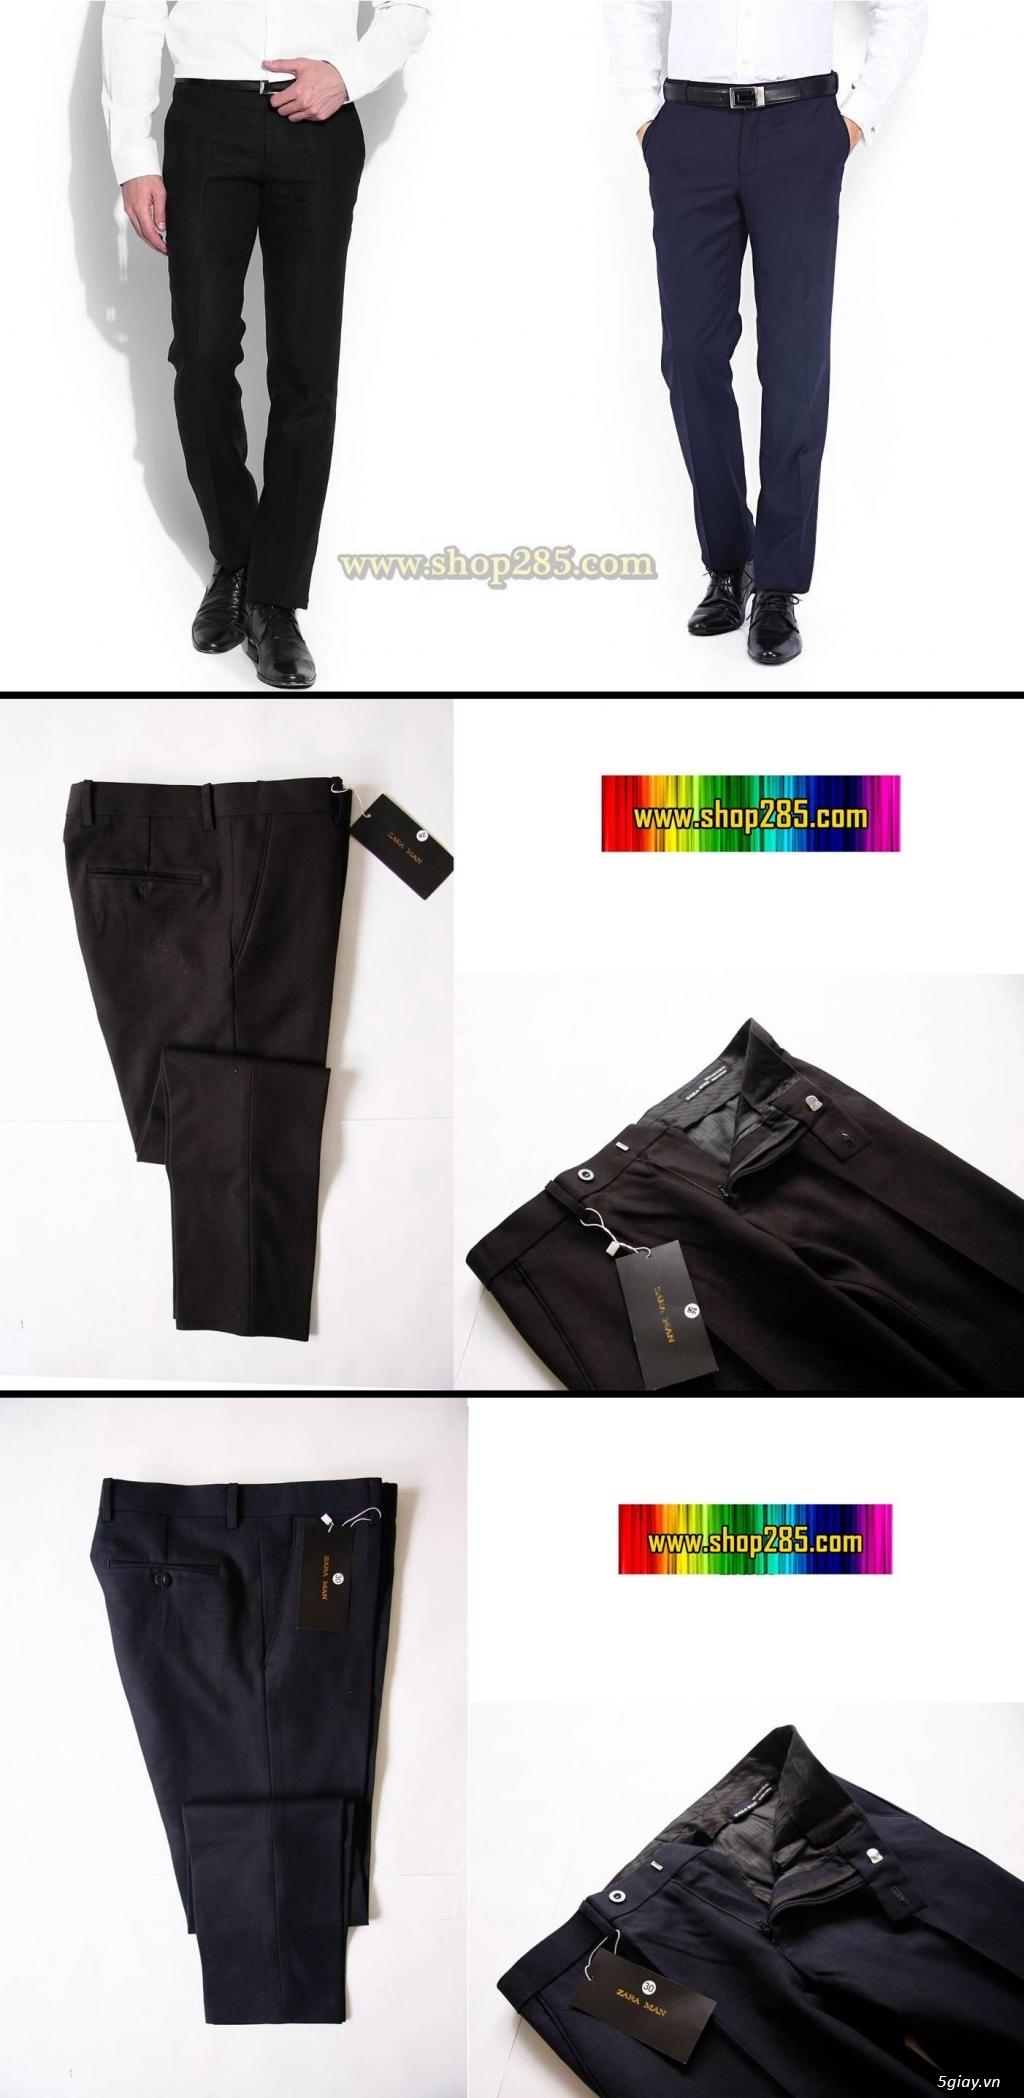 Áo thun Hollister VNXK,áo thun SuperDry VNXK ,áo A&F VNXK ,áo thun cổ tim thun láng - 9